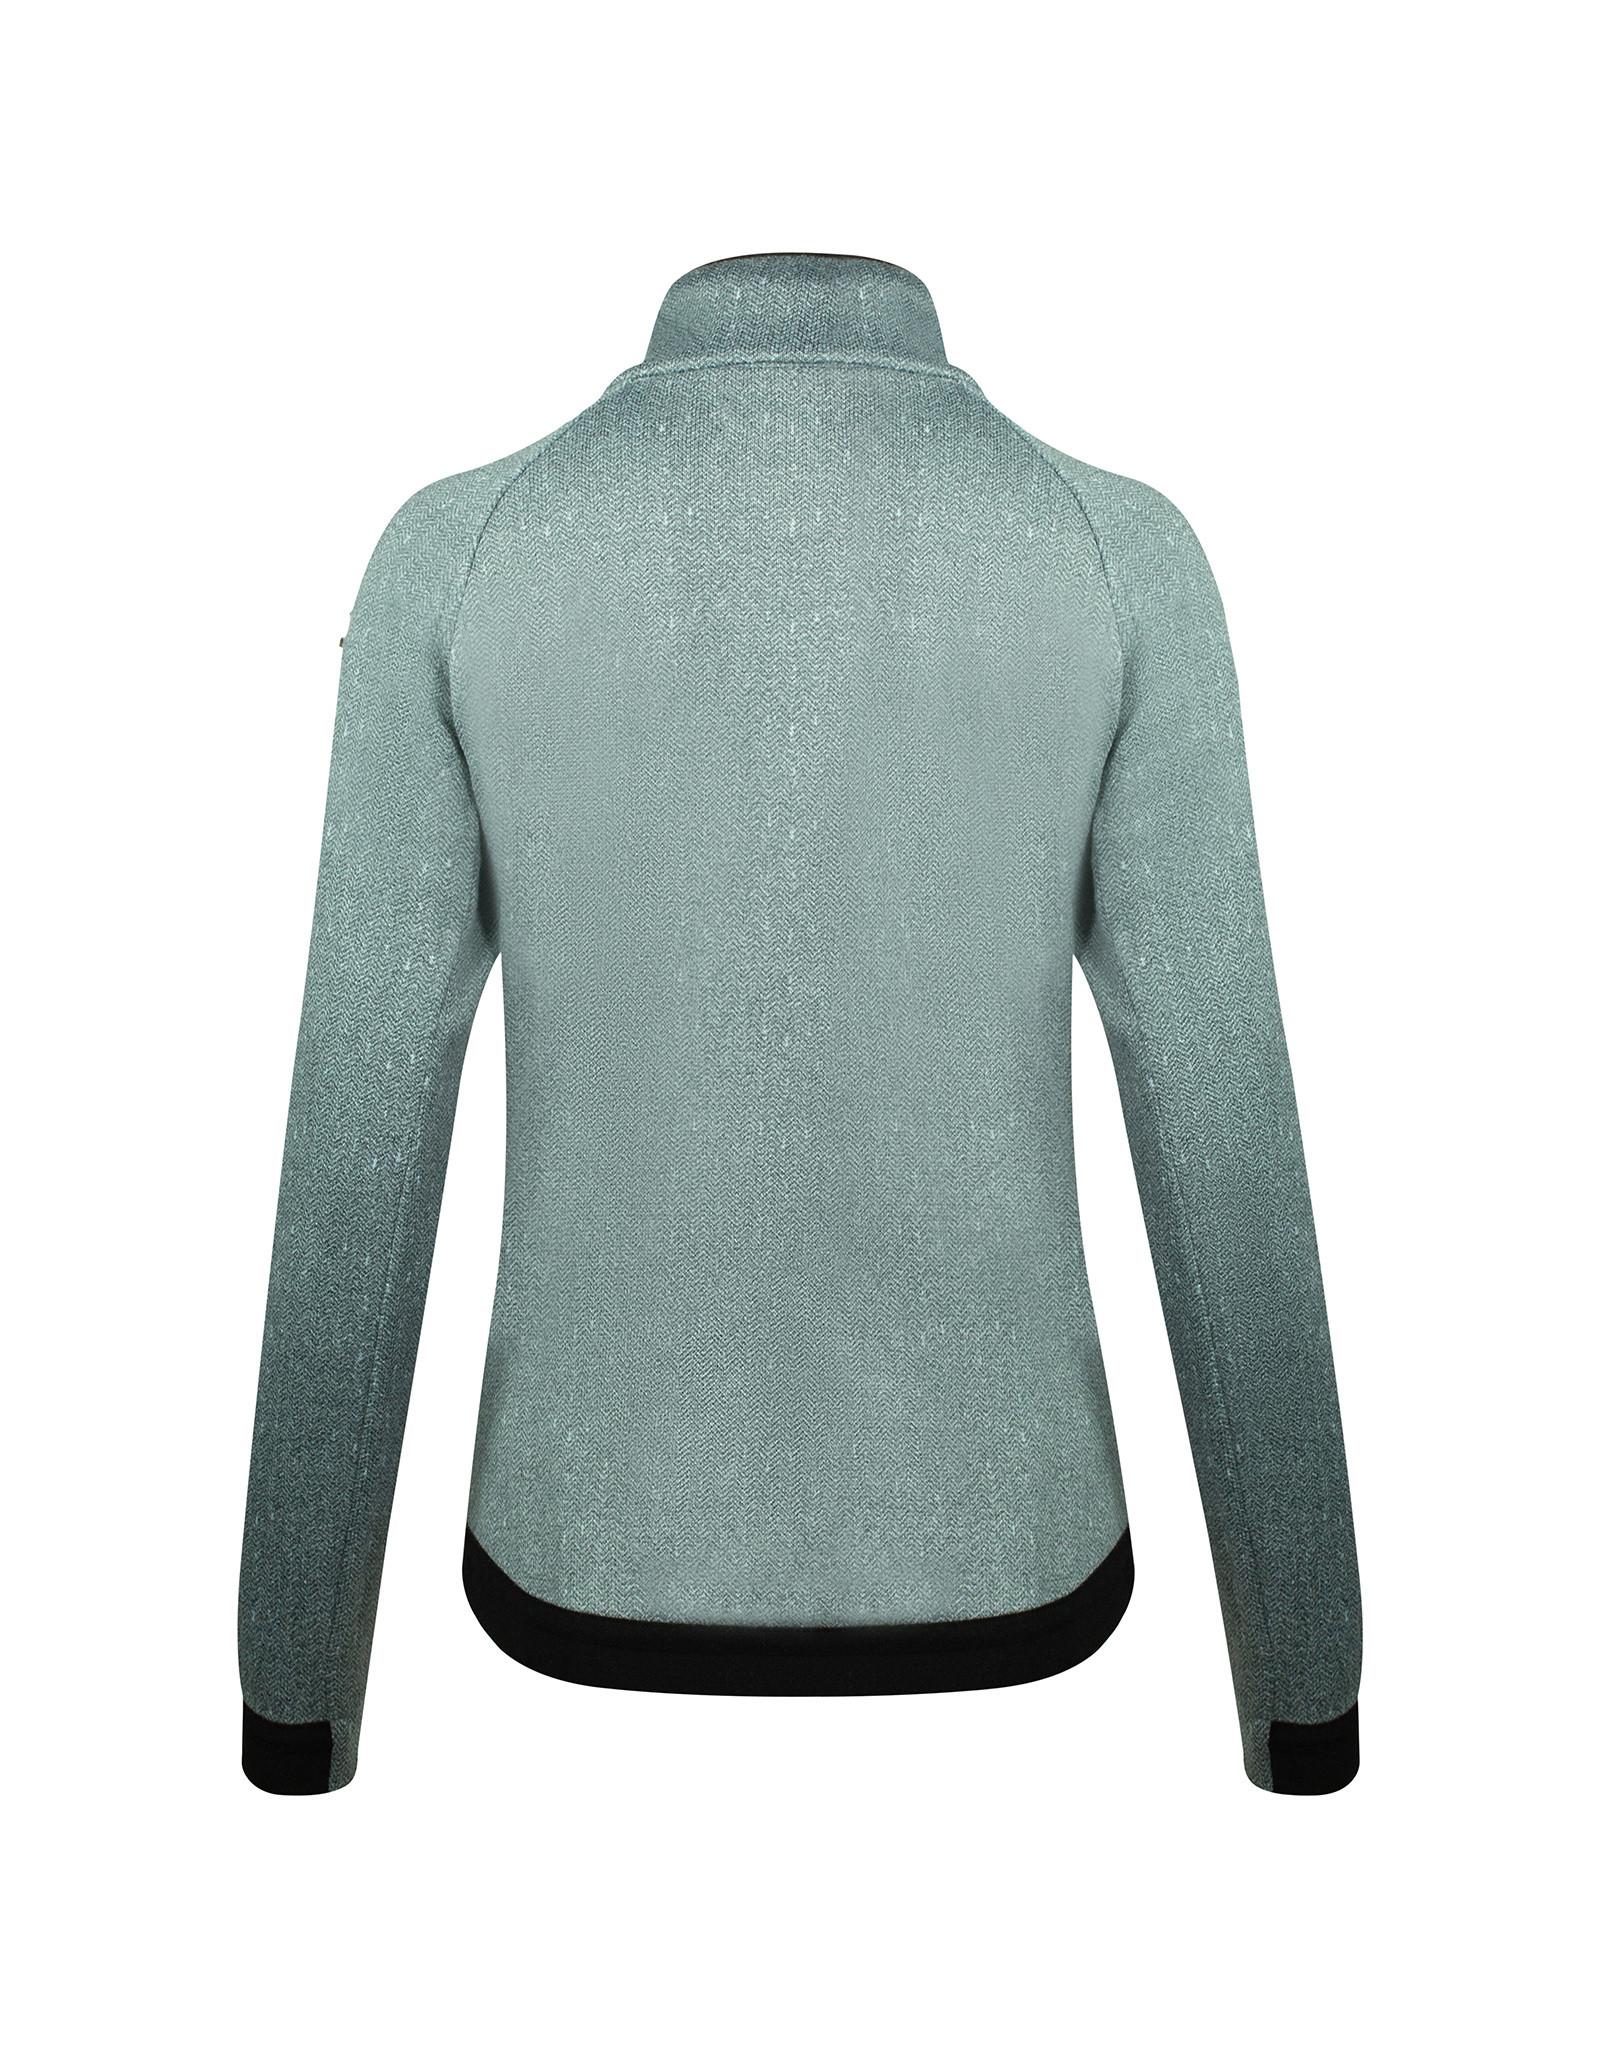 Horze Sarina Women's Knit Fleece Jacket